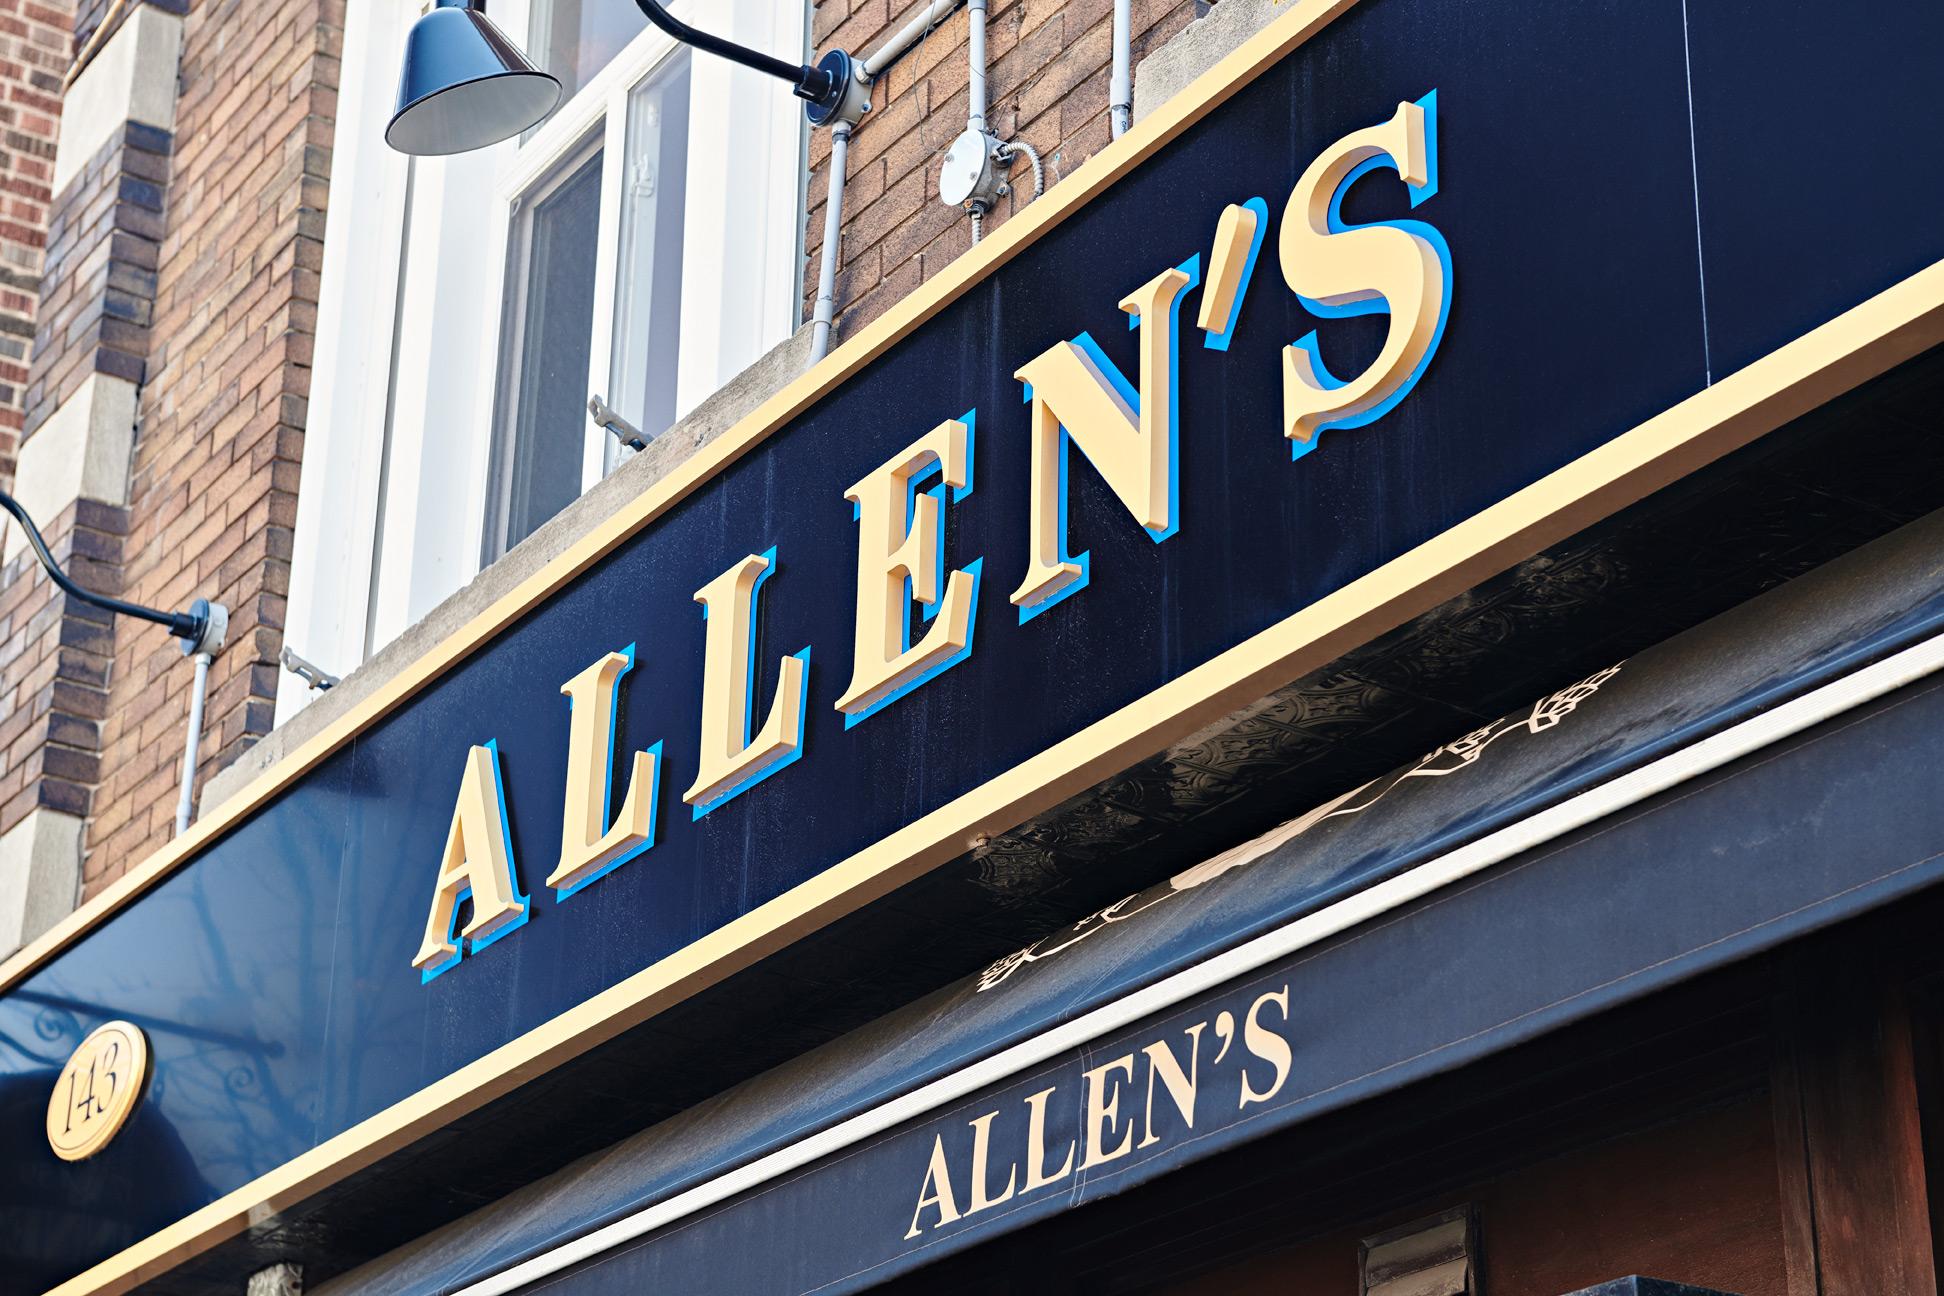 Allens.jpg